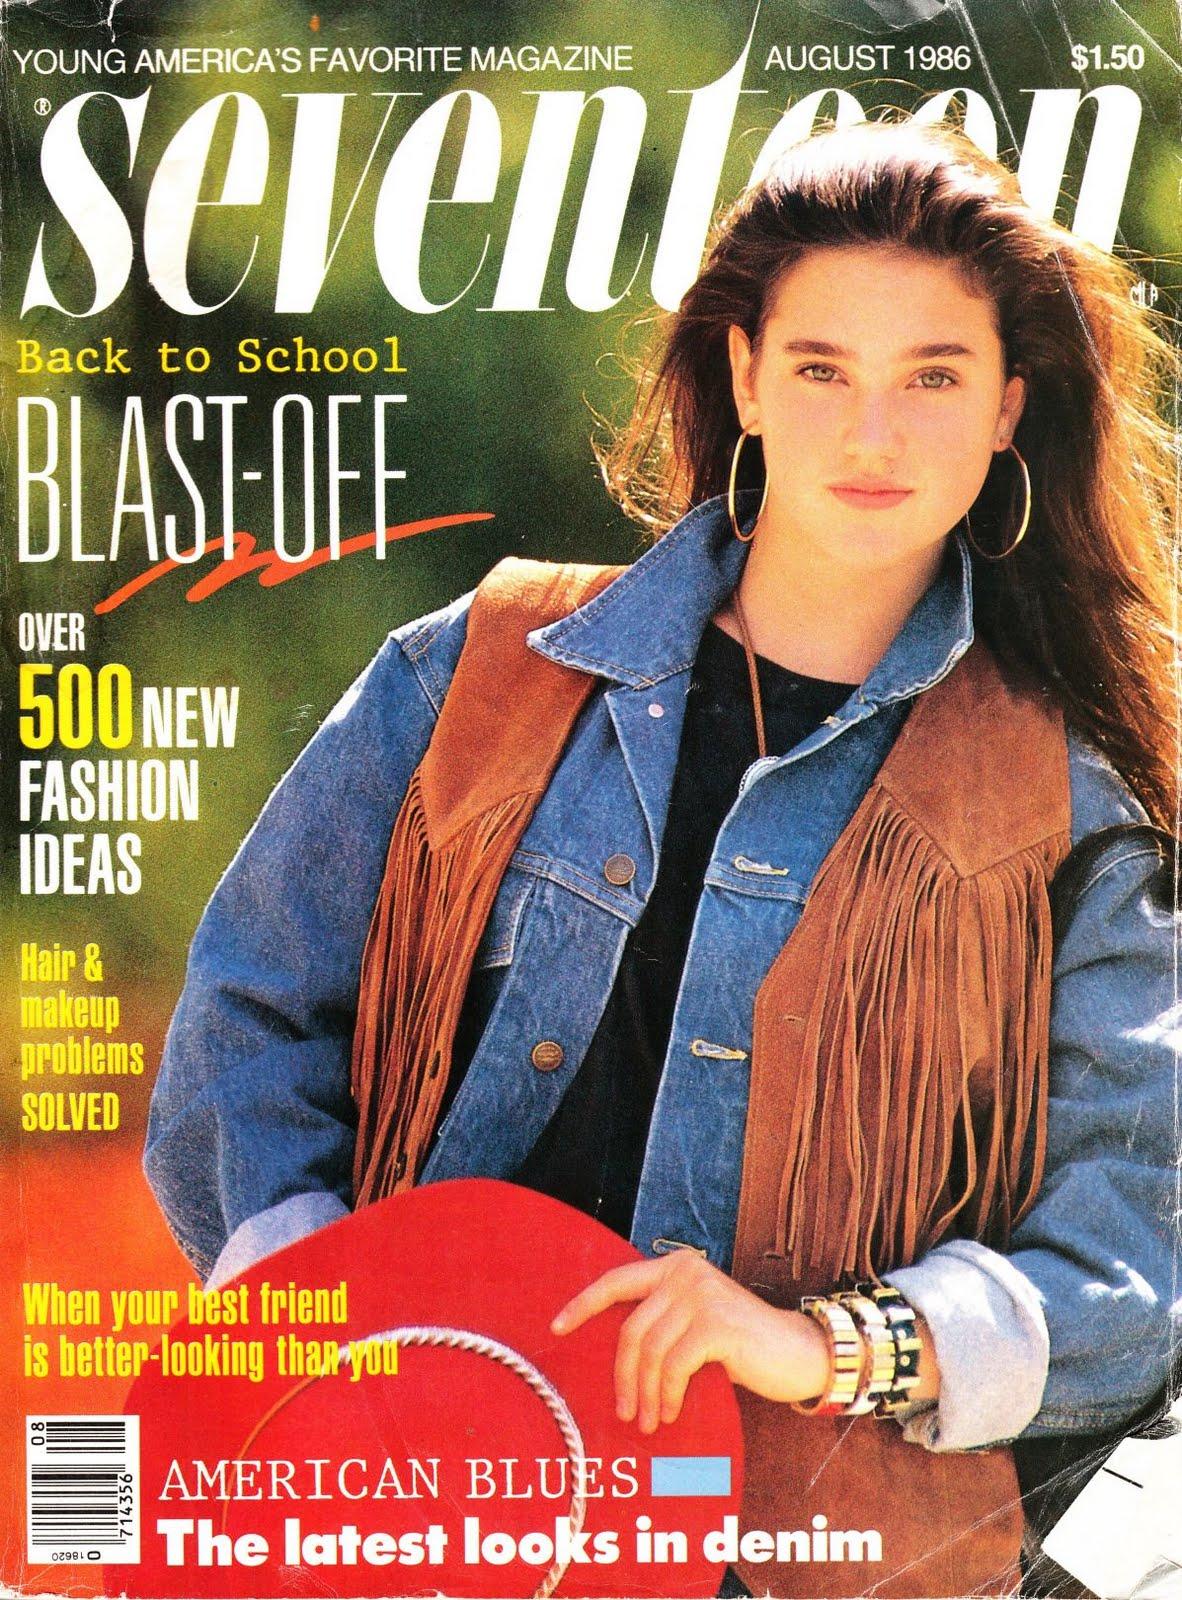 seventeen_1986-cover1.jpg